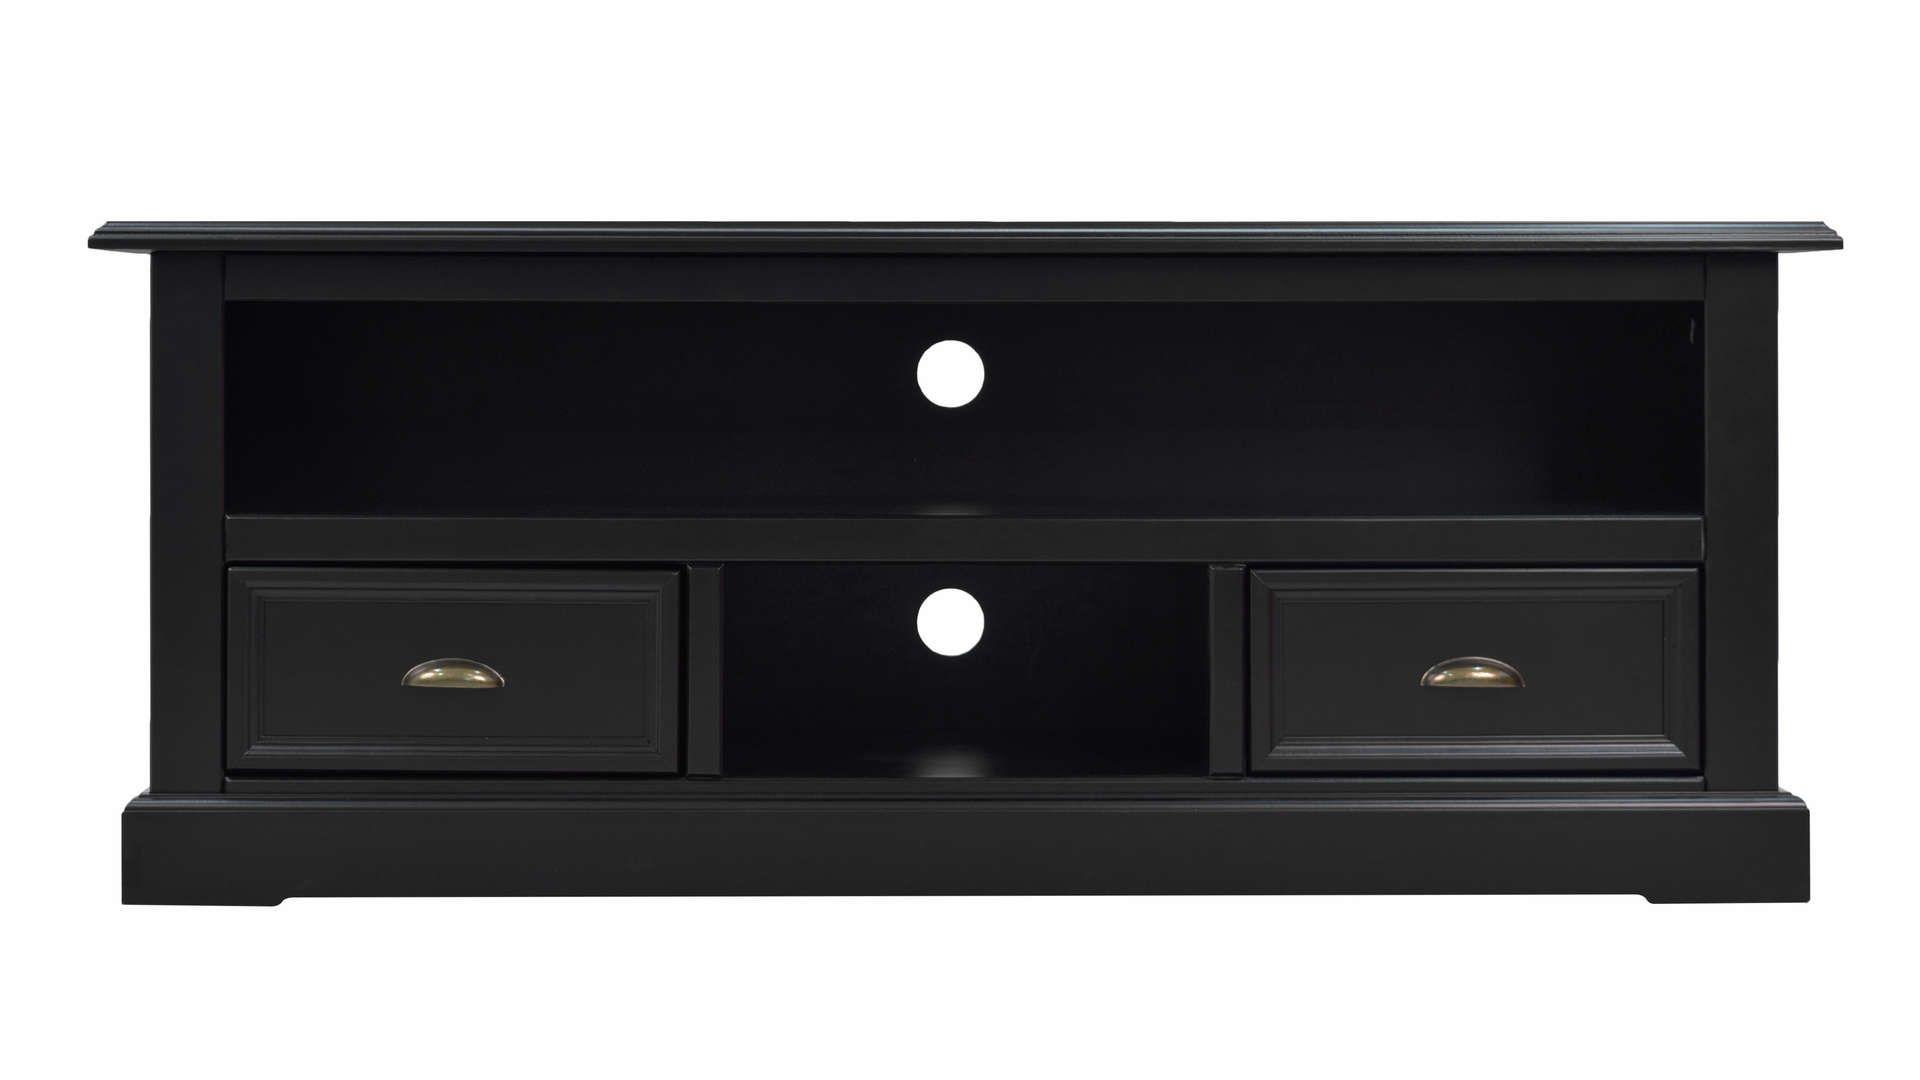 Meuble Tv Ebony Coloris Noir Meuble Conforama